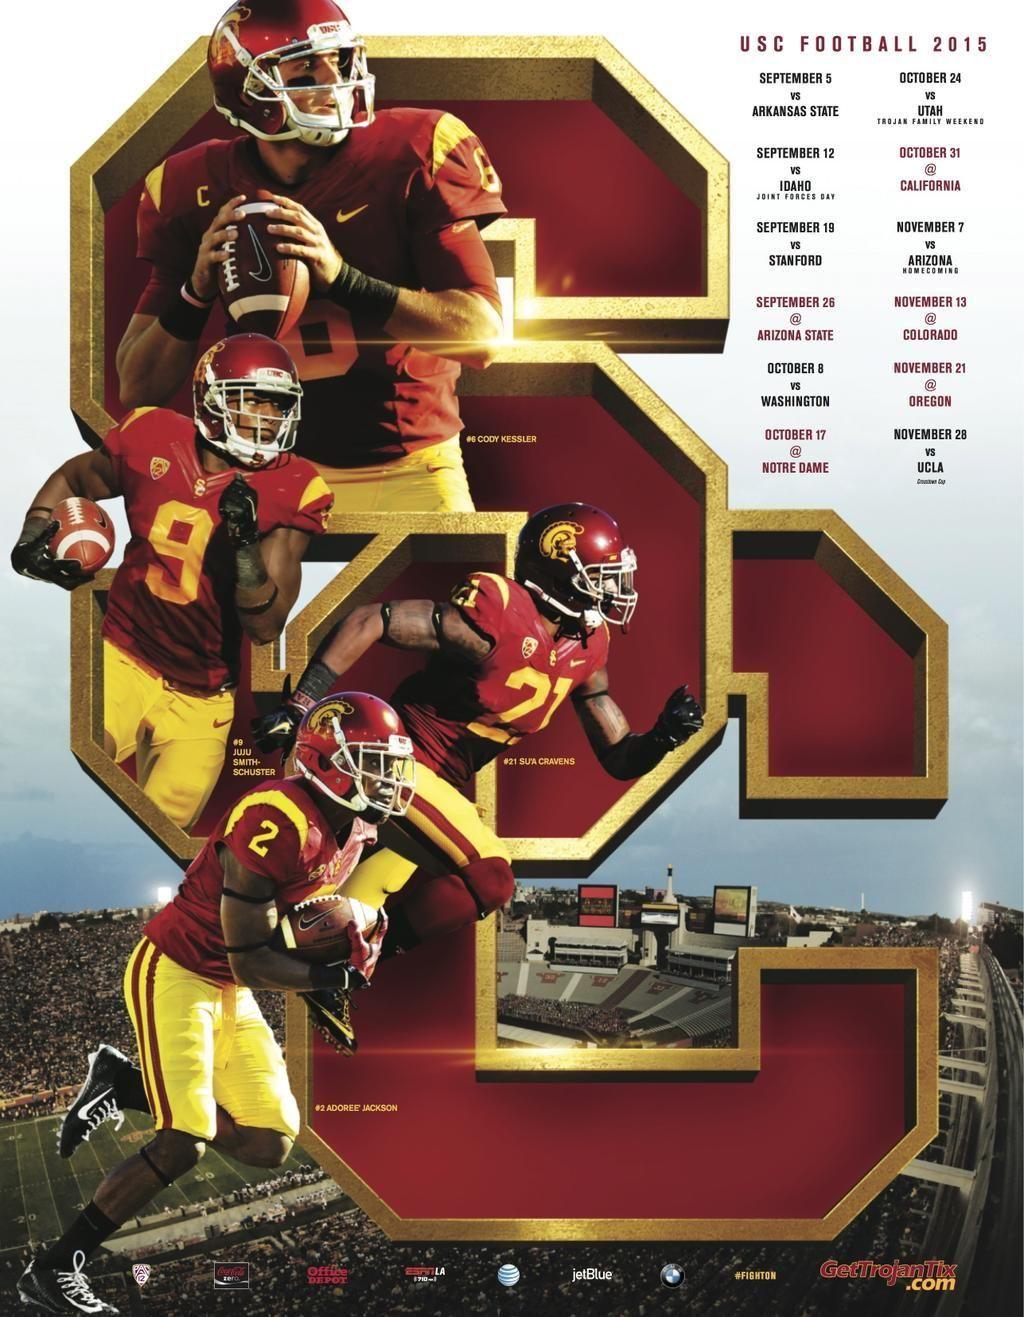 Poster Swag On Usc Athletics Usc Trojans University Of